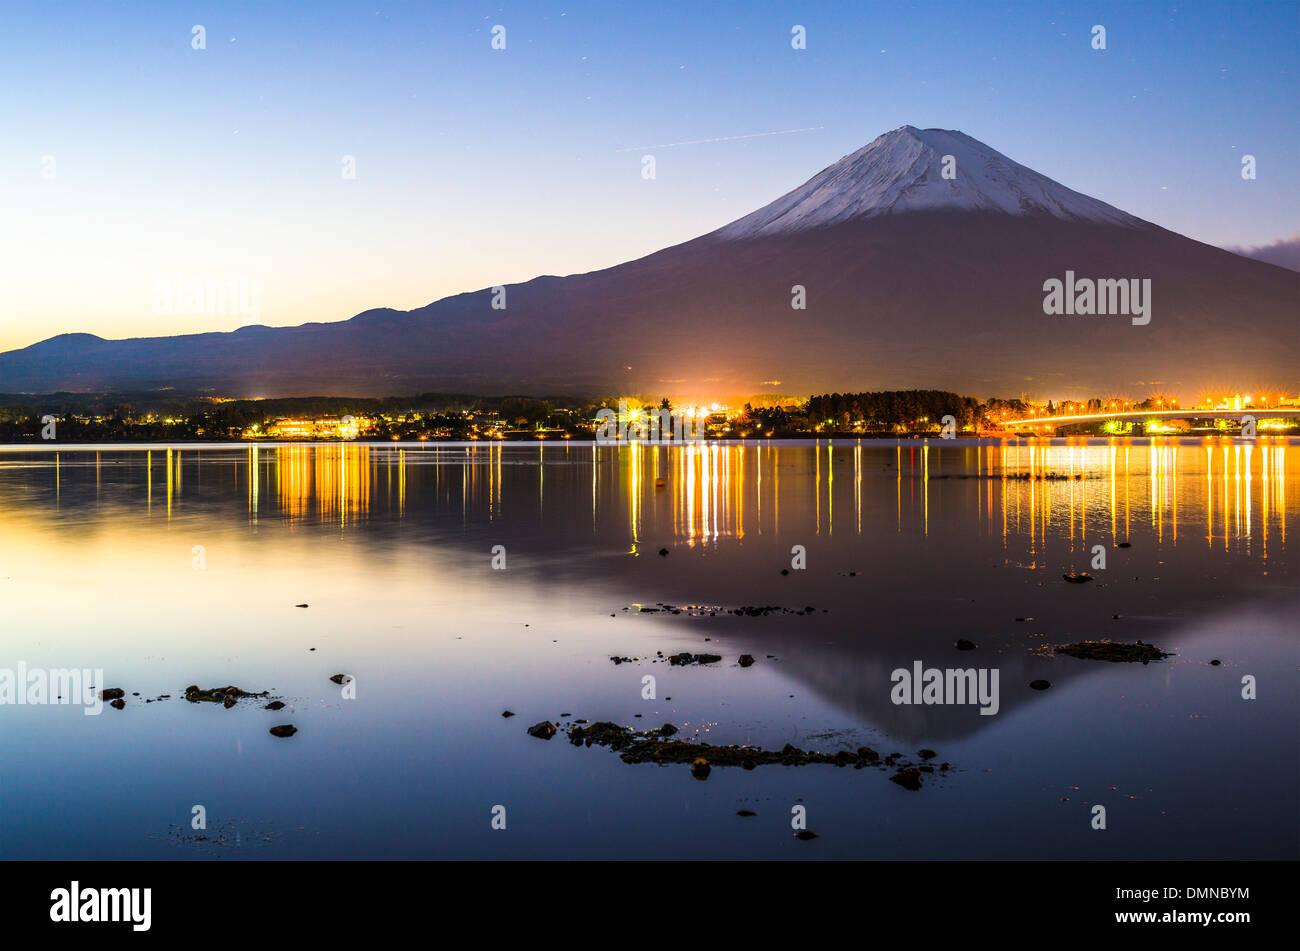 Mt. Fuji in der Abenddämmerung über Kawaguchi-See in Japan. Stockbild